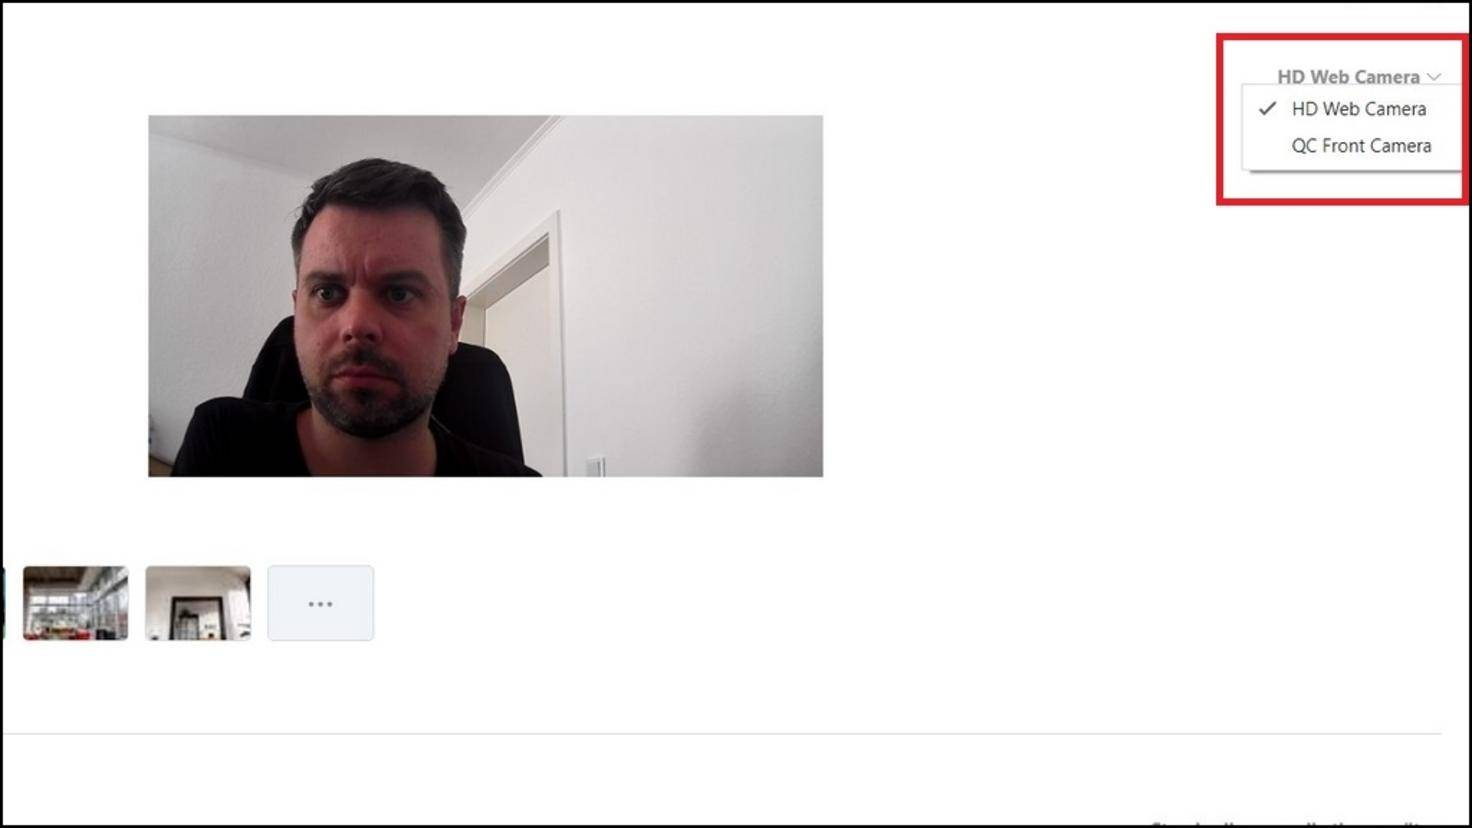 Webcam-Windows-10-Skype-02